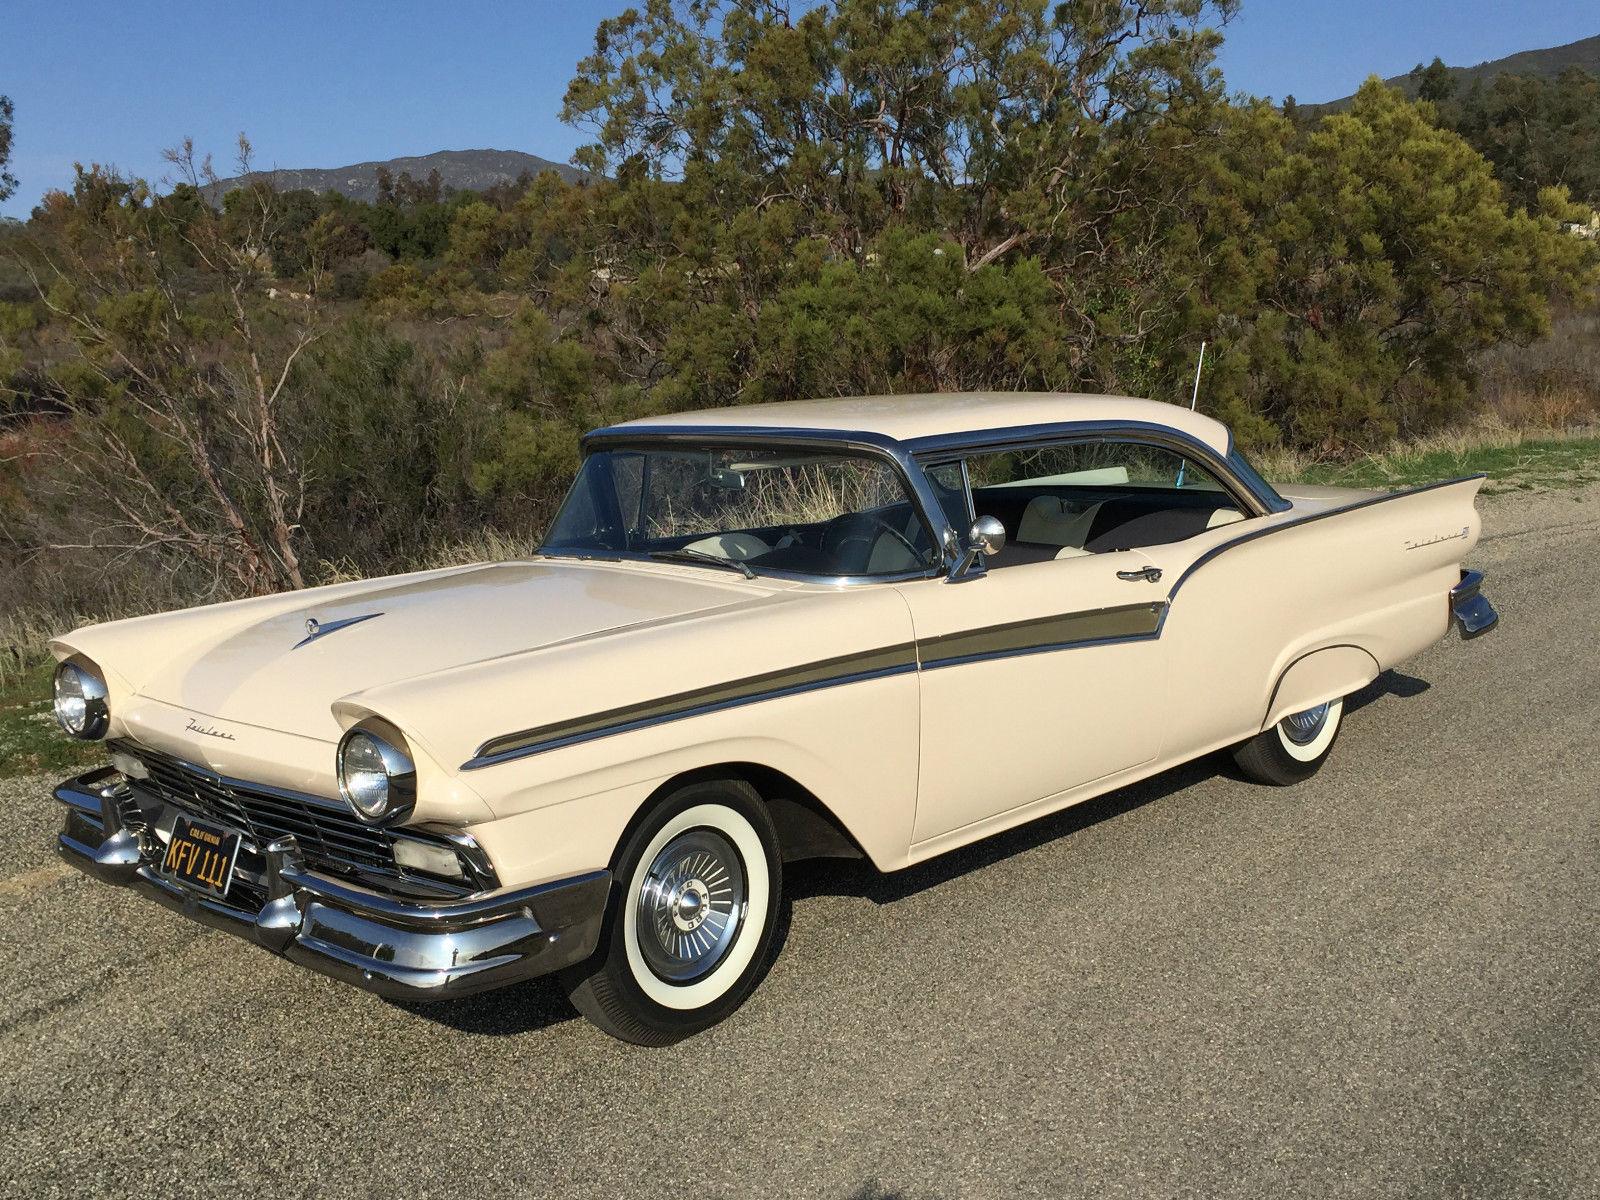 Wonderful 1957 Ford Fairlane Michaelieclark Wiring Diagram 1956 Sunliner 500 Club Victoria 2 Door Hardtop California Car Restored For Sale In Aguanga